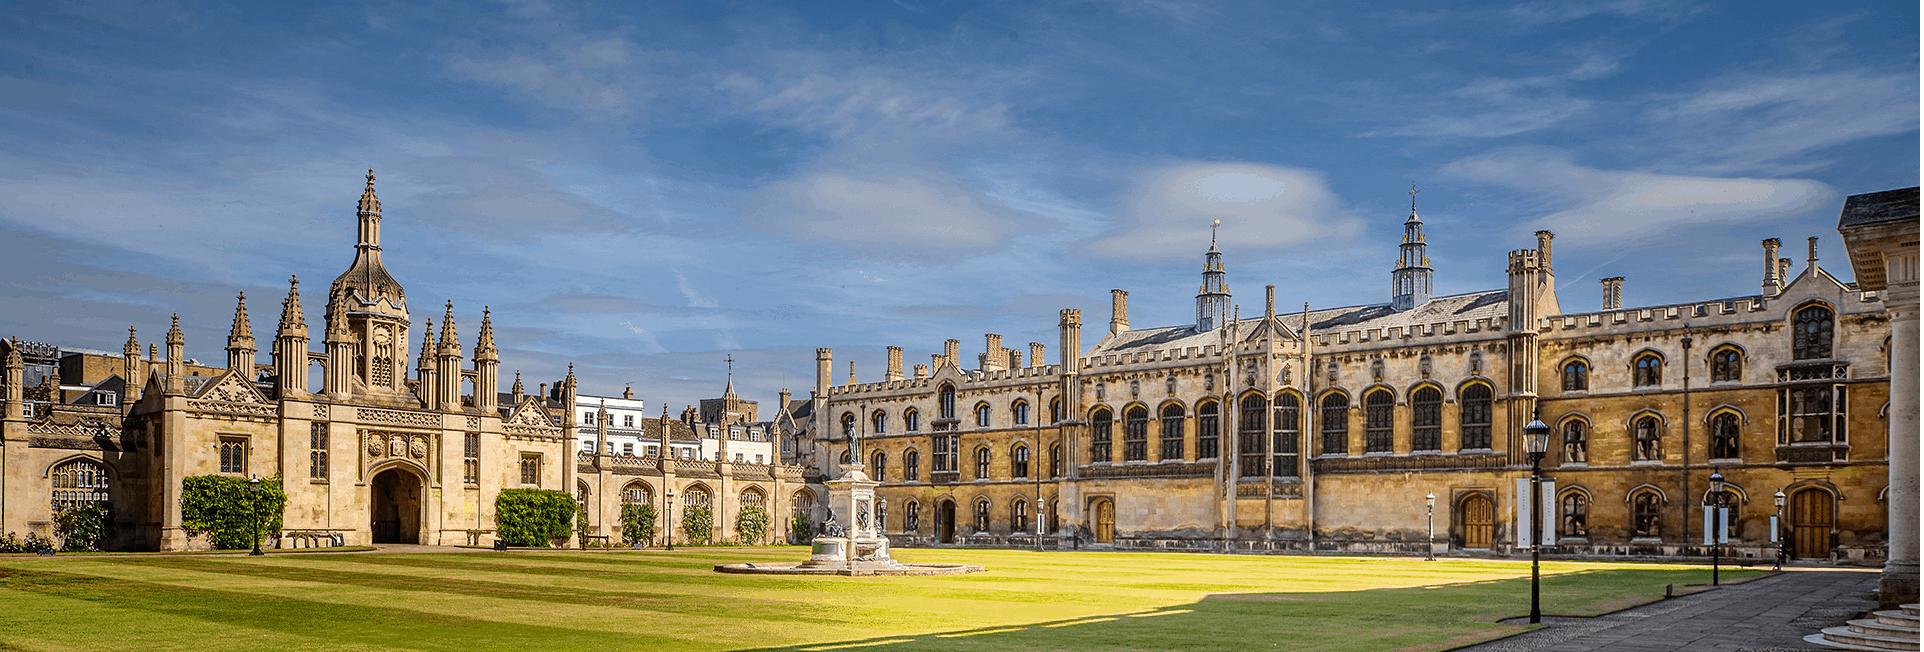 Cambridge Rare Disease Network - RAREsummit21 Agenda - Draft 1